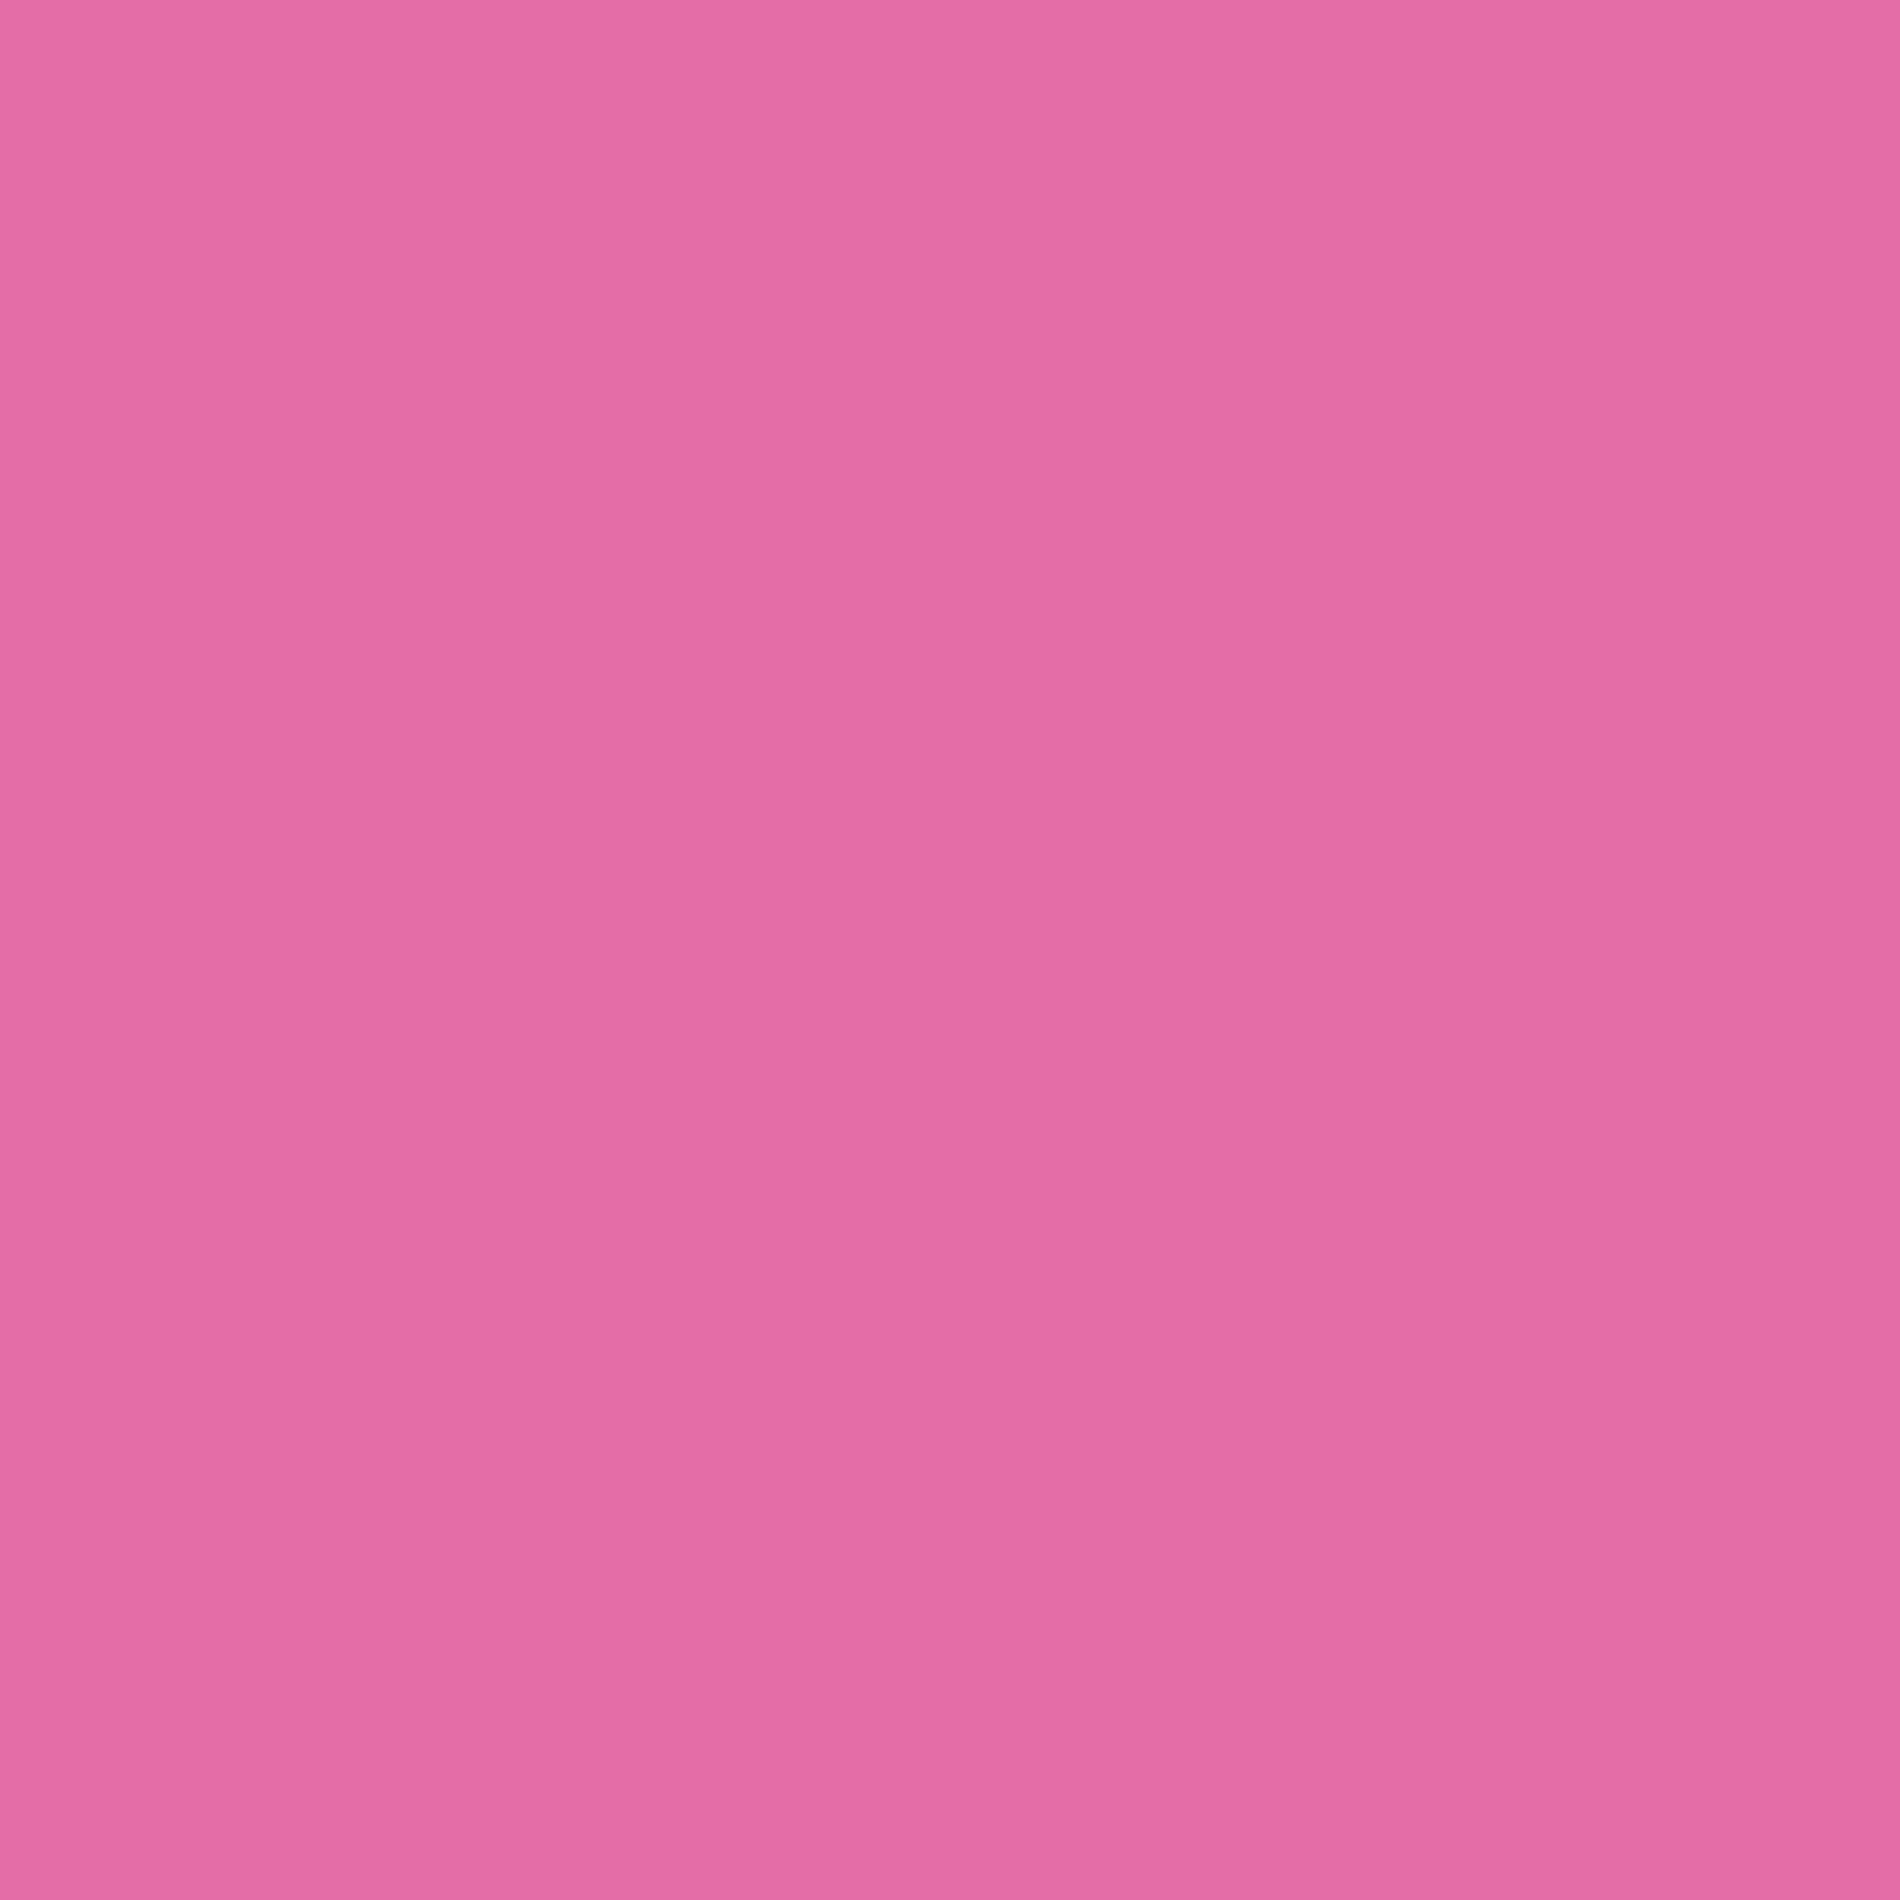 pink 71